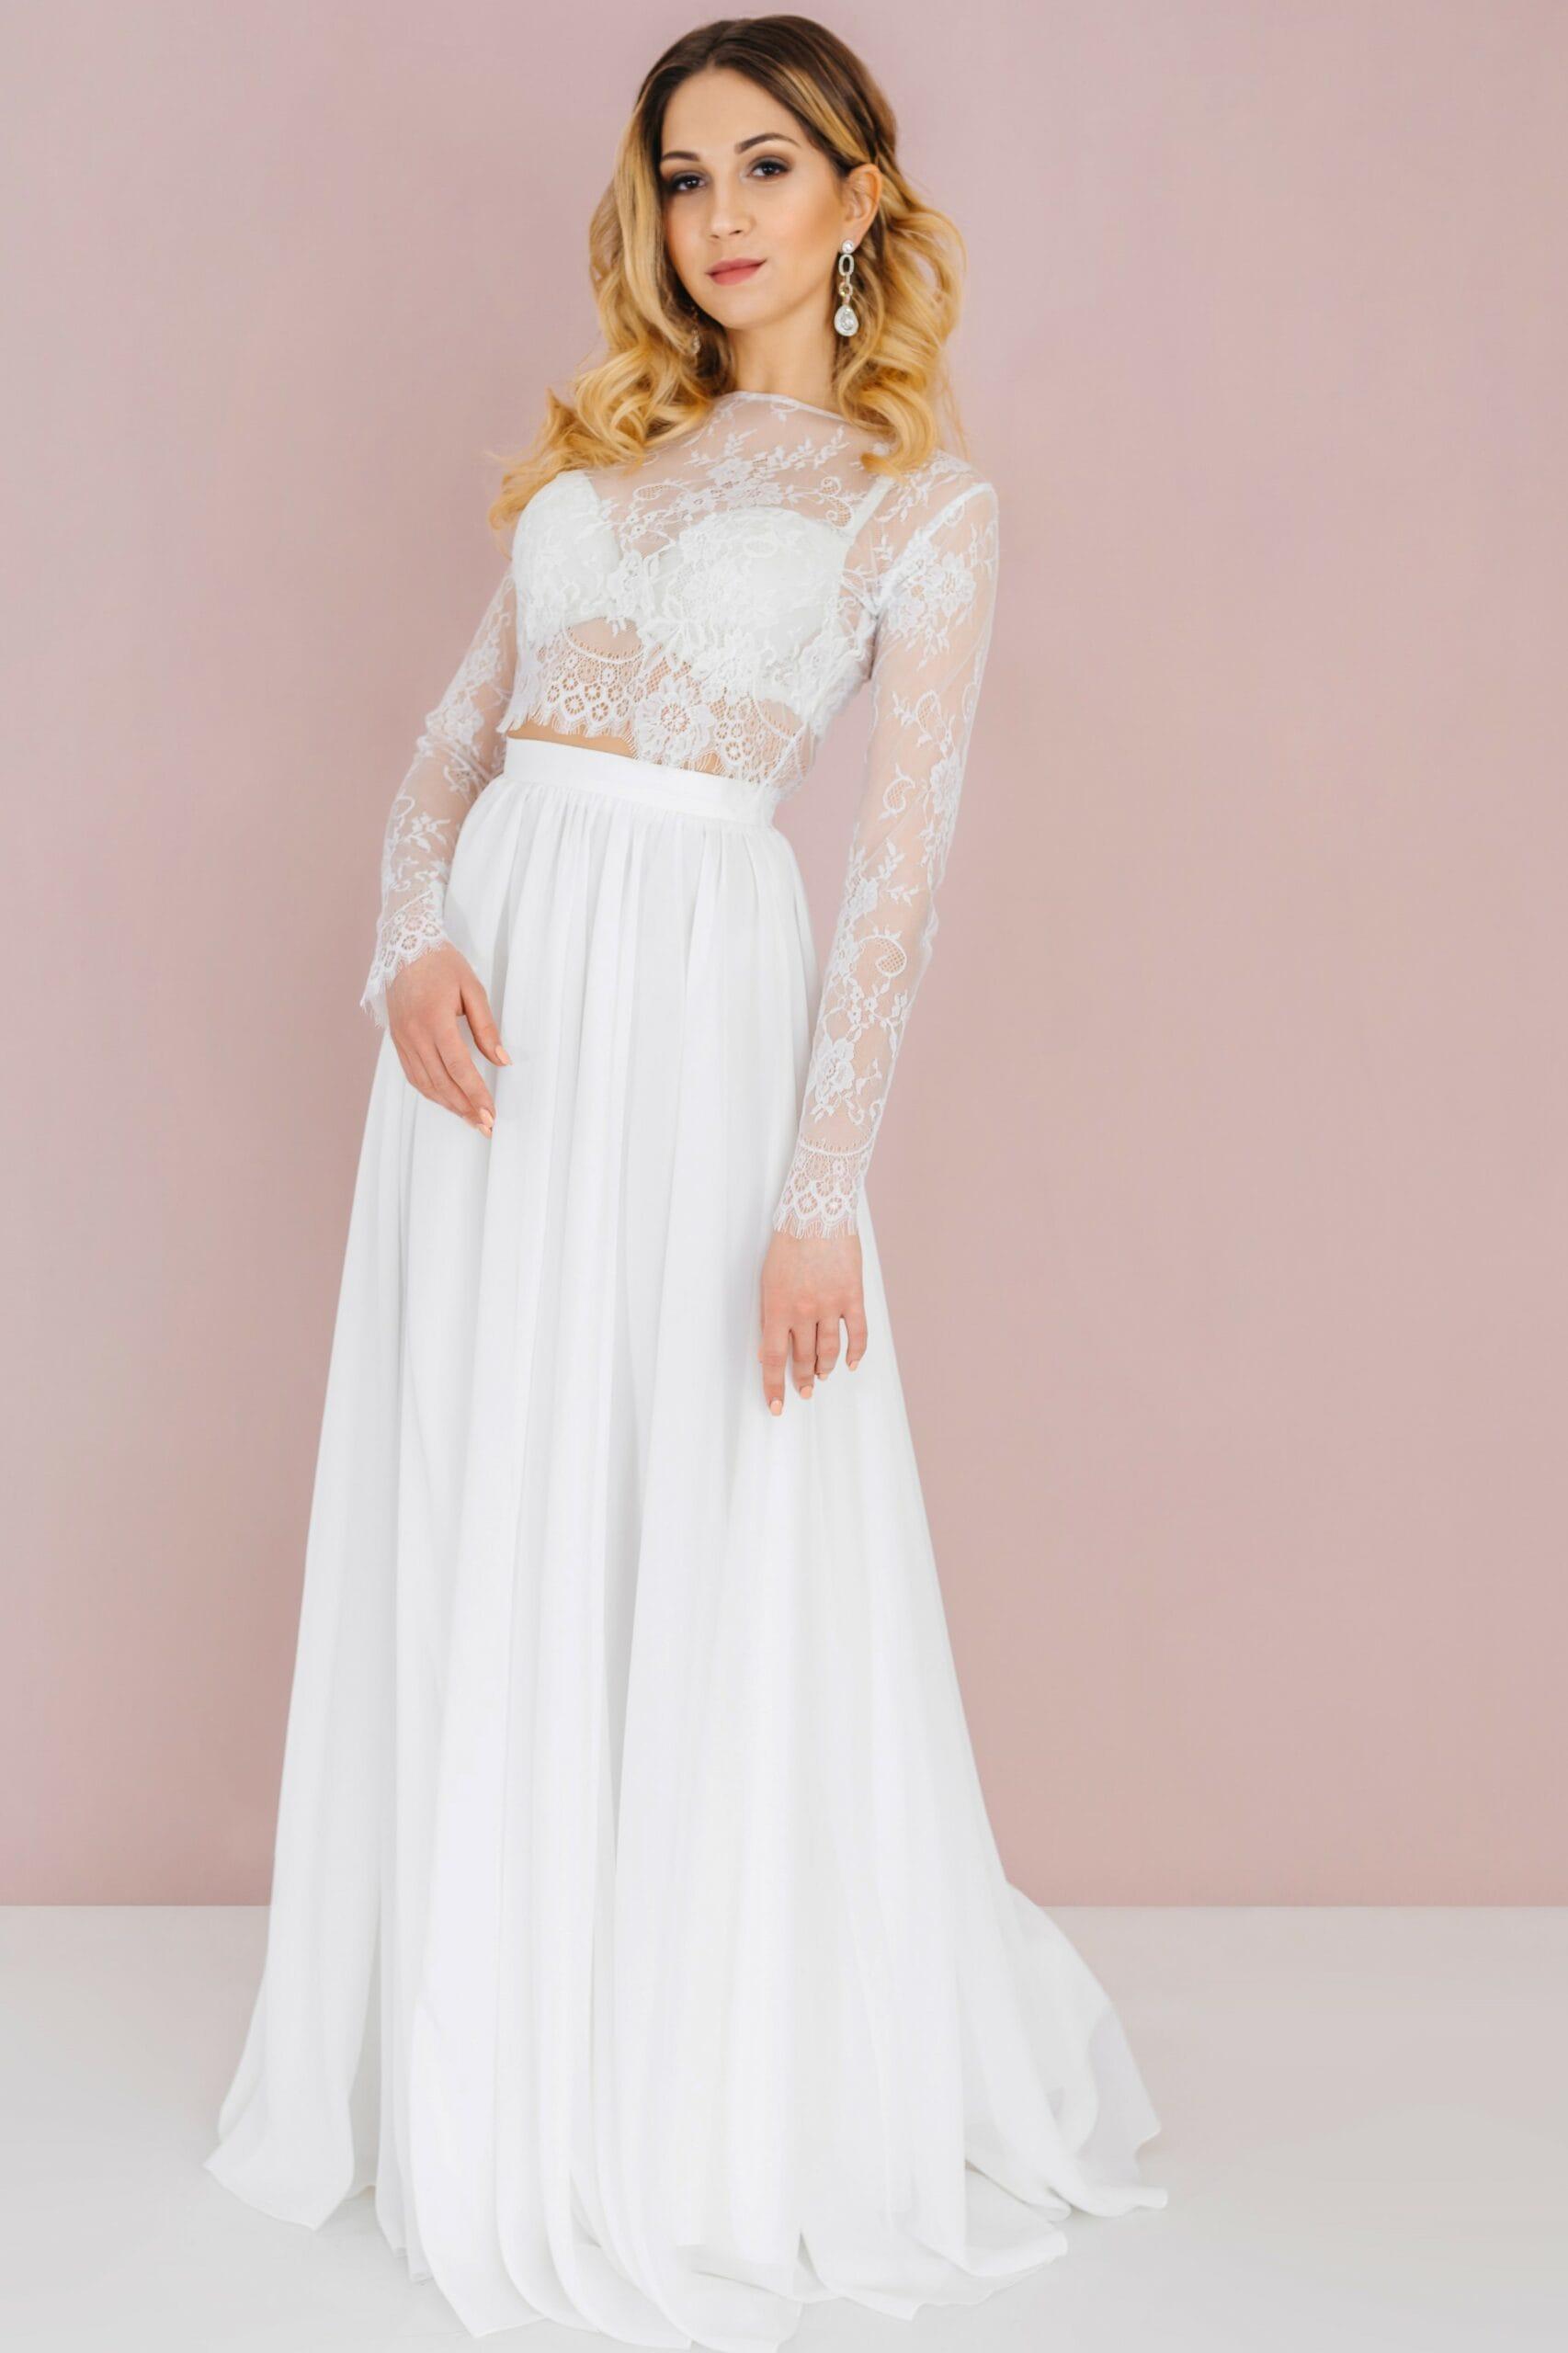 Свадебное платье CHALSIE, коллекция LOFT, бренд RARE BRIDAL, фото 2